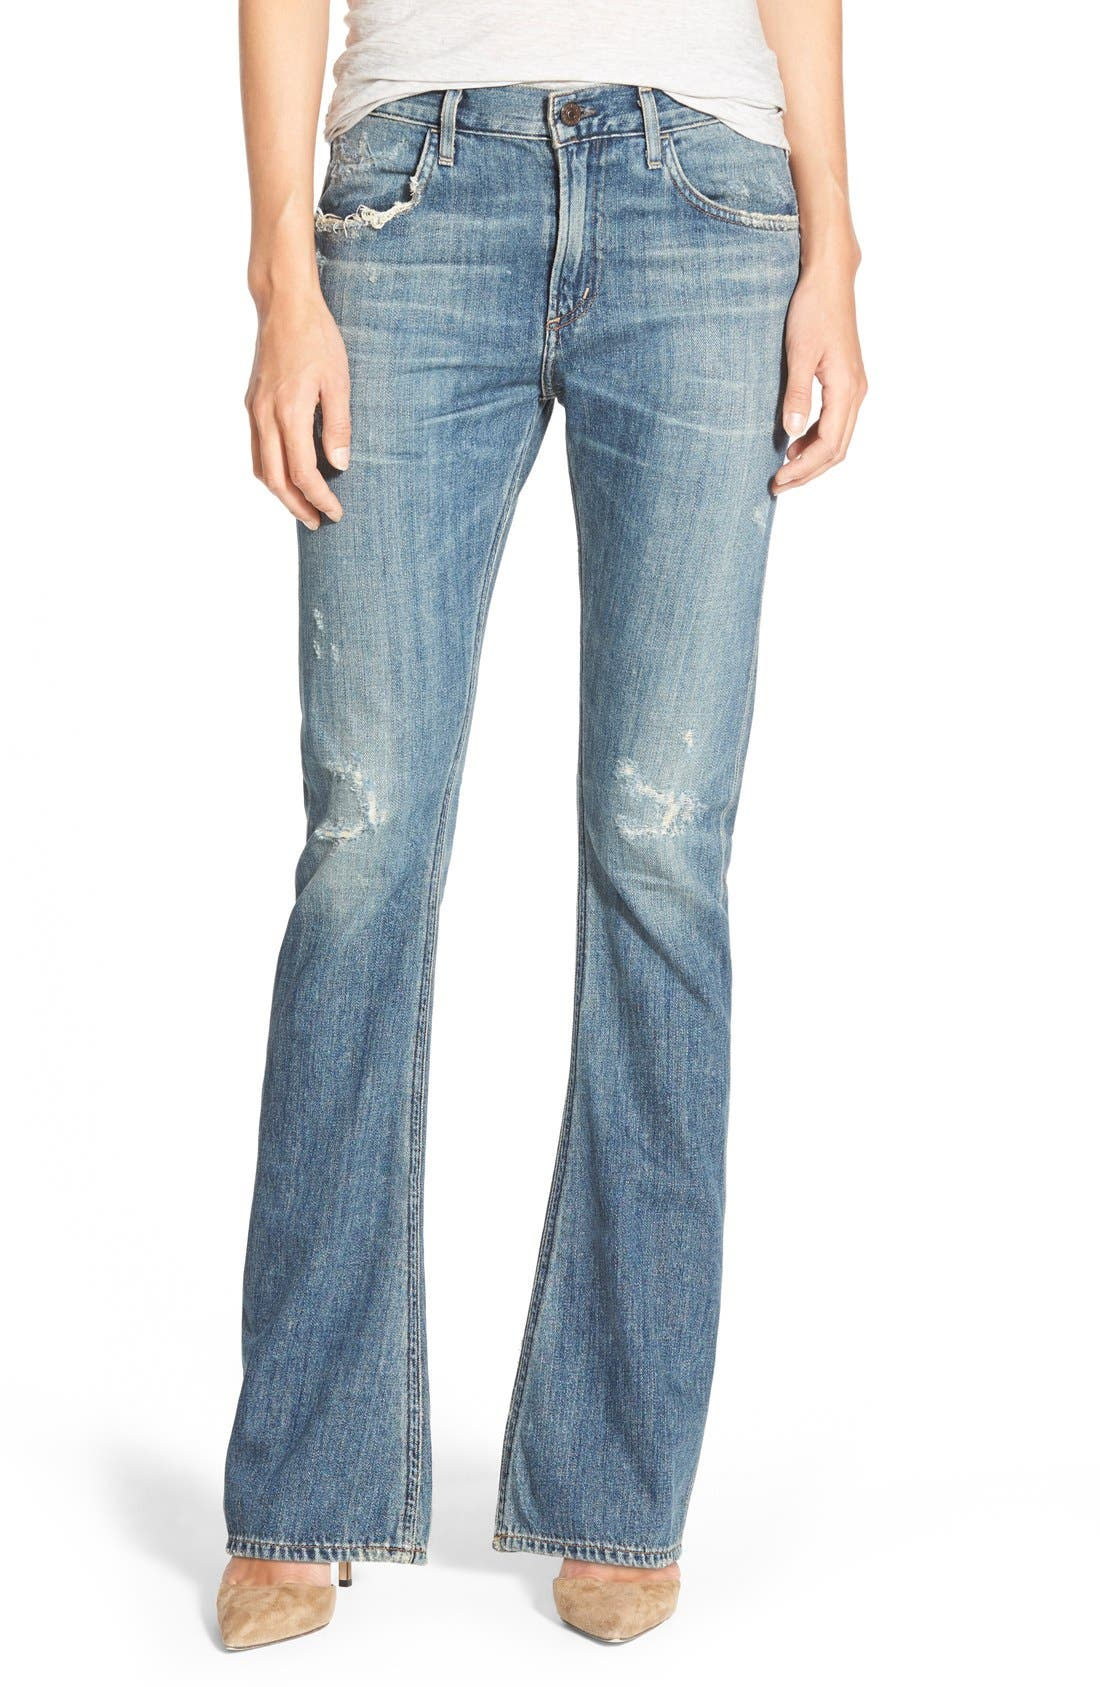 15bd1c63cbbb86 Women s Light Blue Wash Distressed Jeans